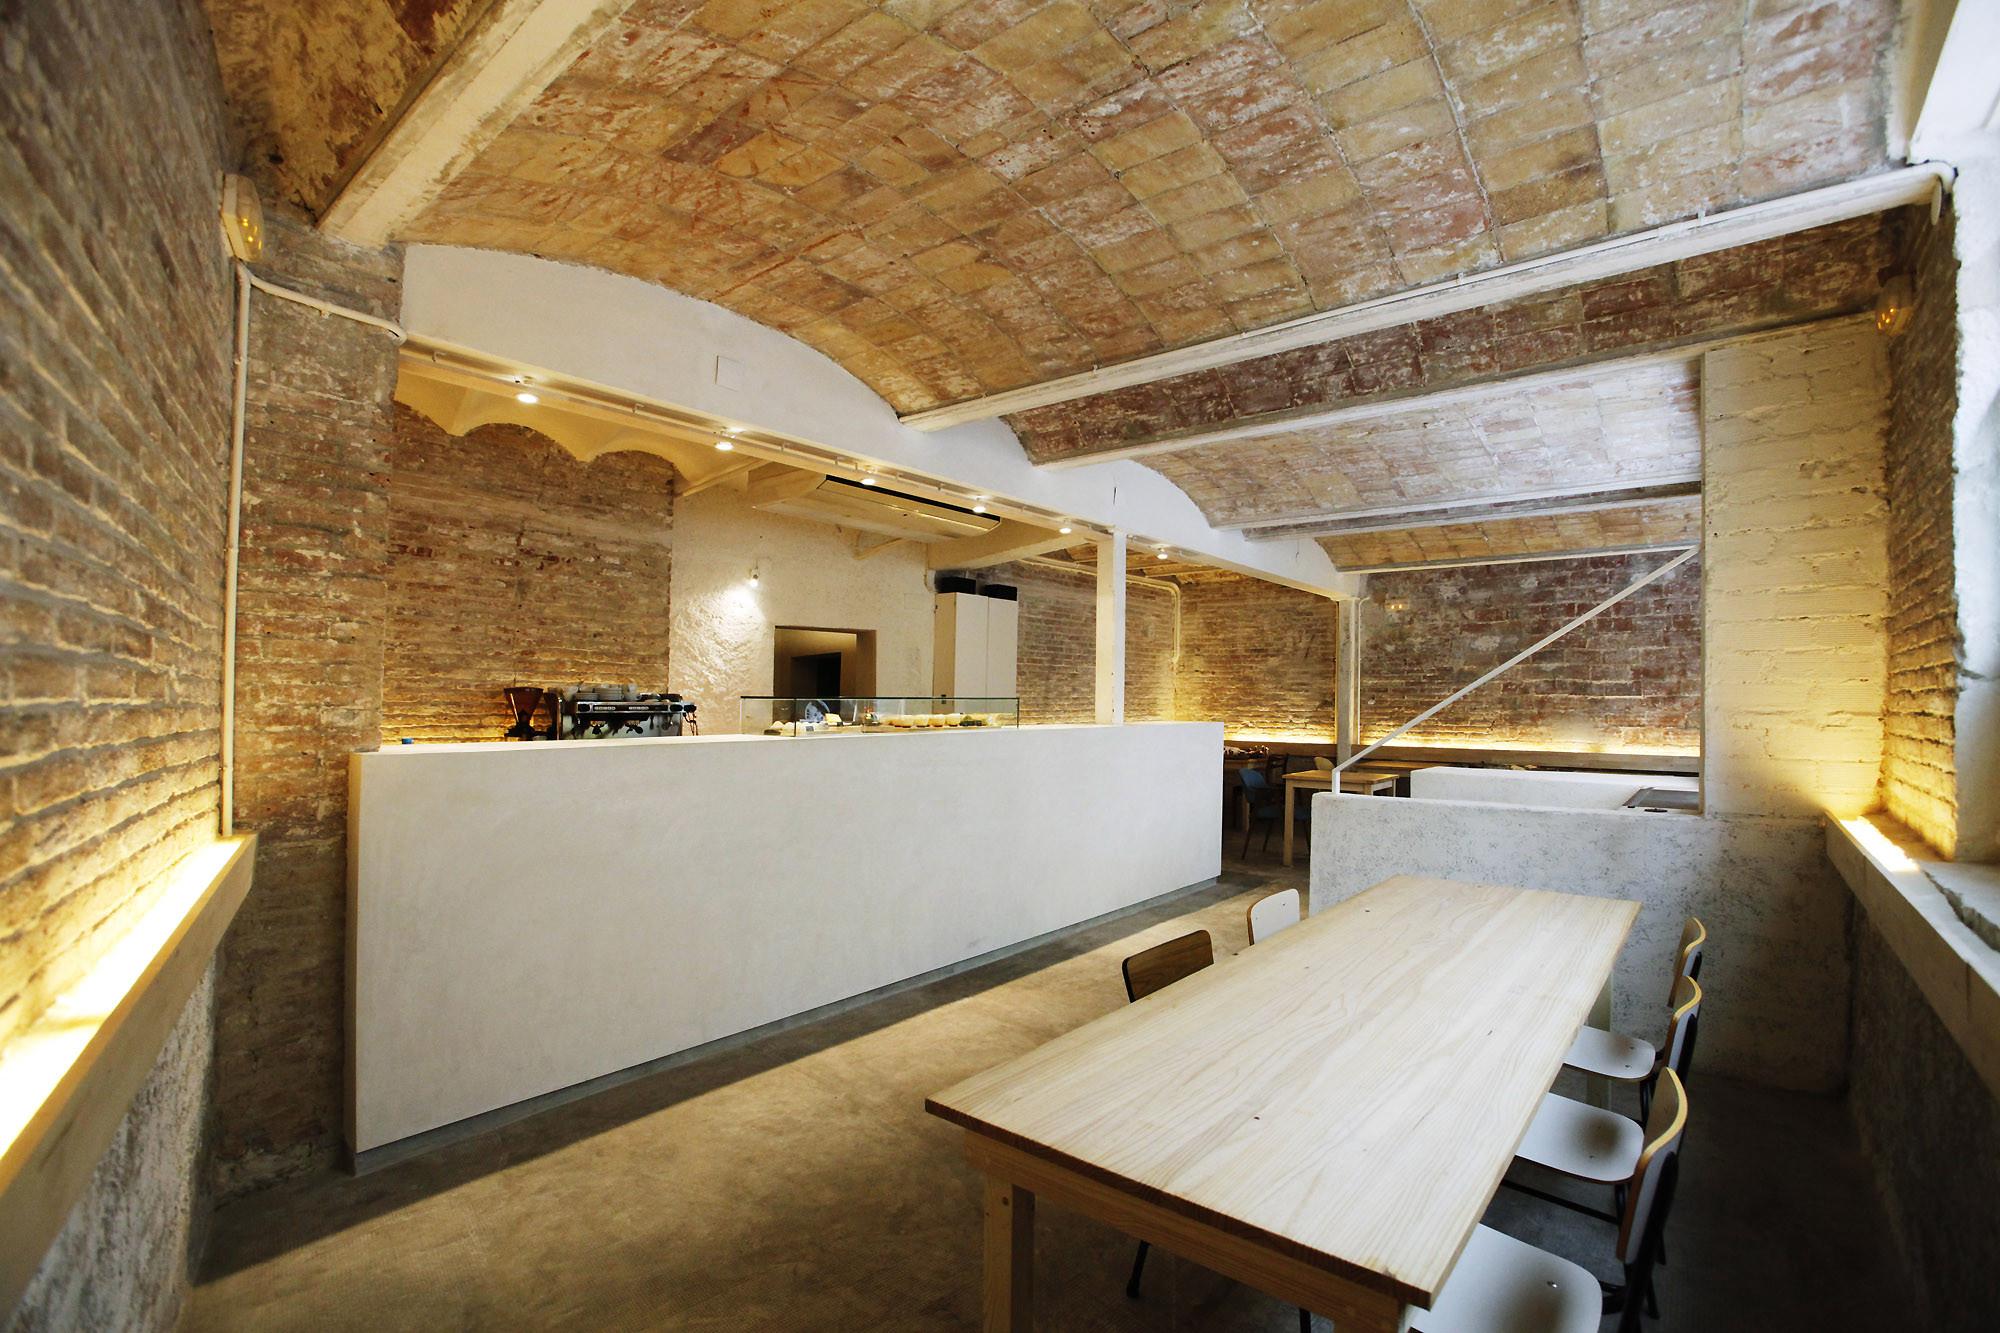 Usagui Teahouse / Kazuya Morita Architecture Studio, © Daisuke Nakashima